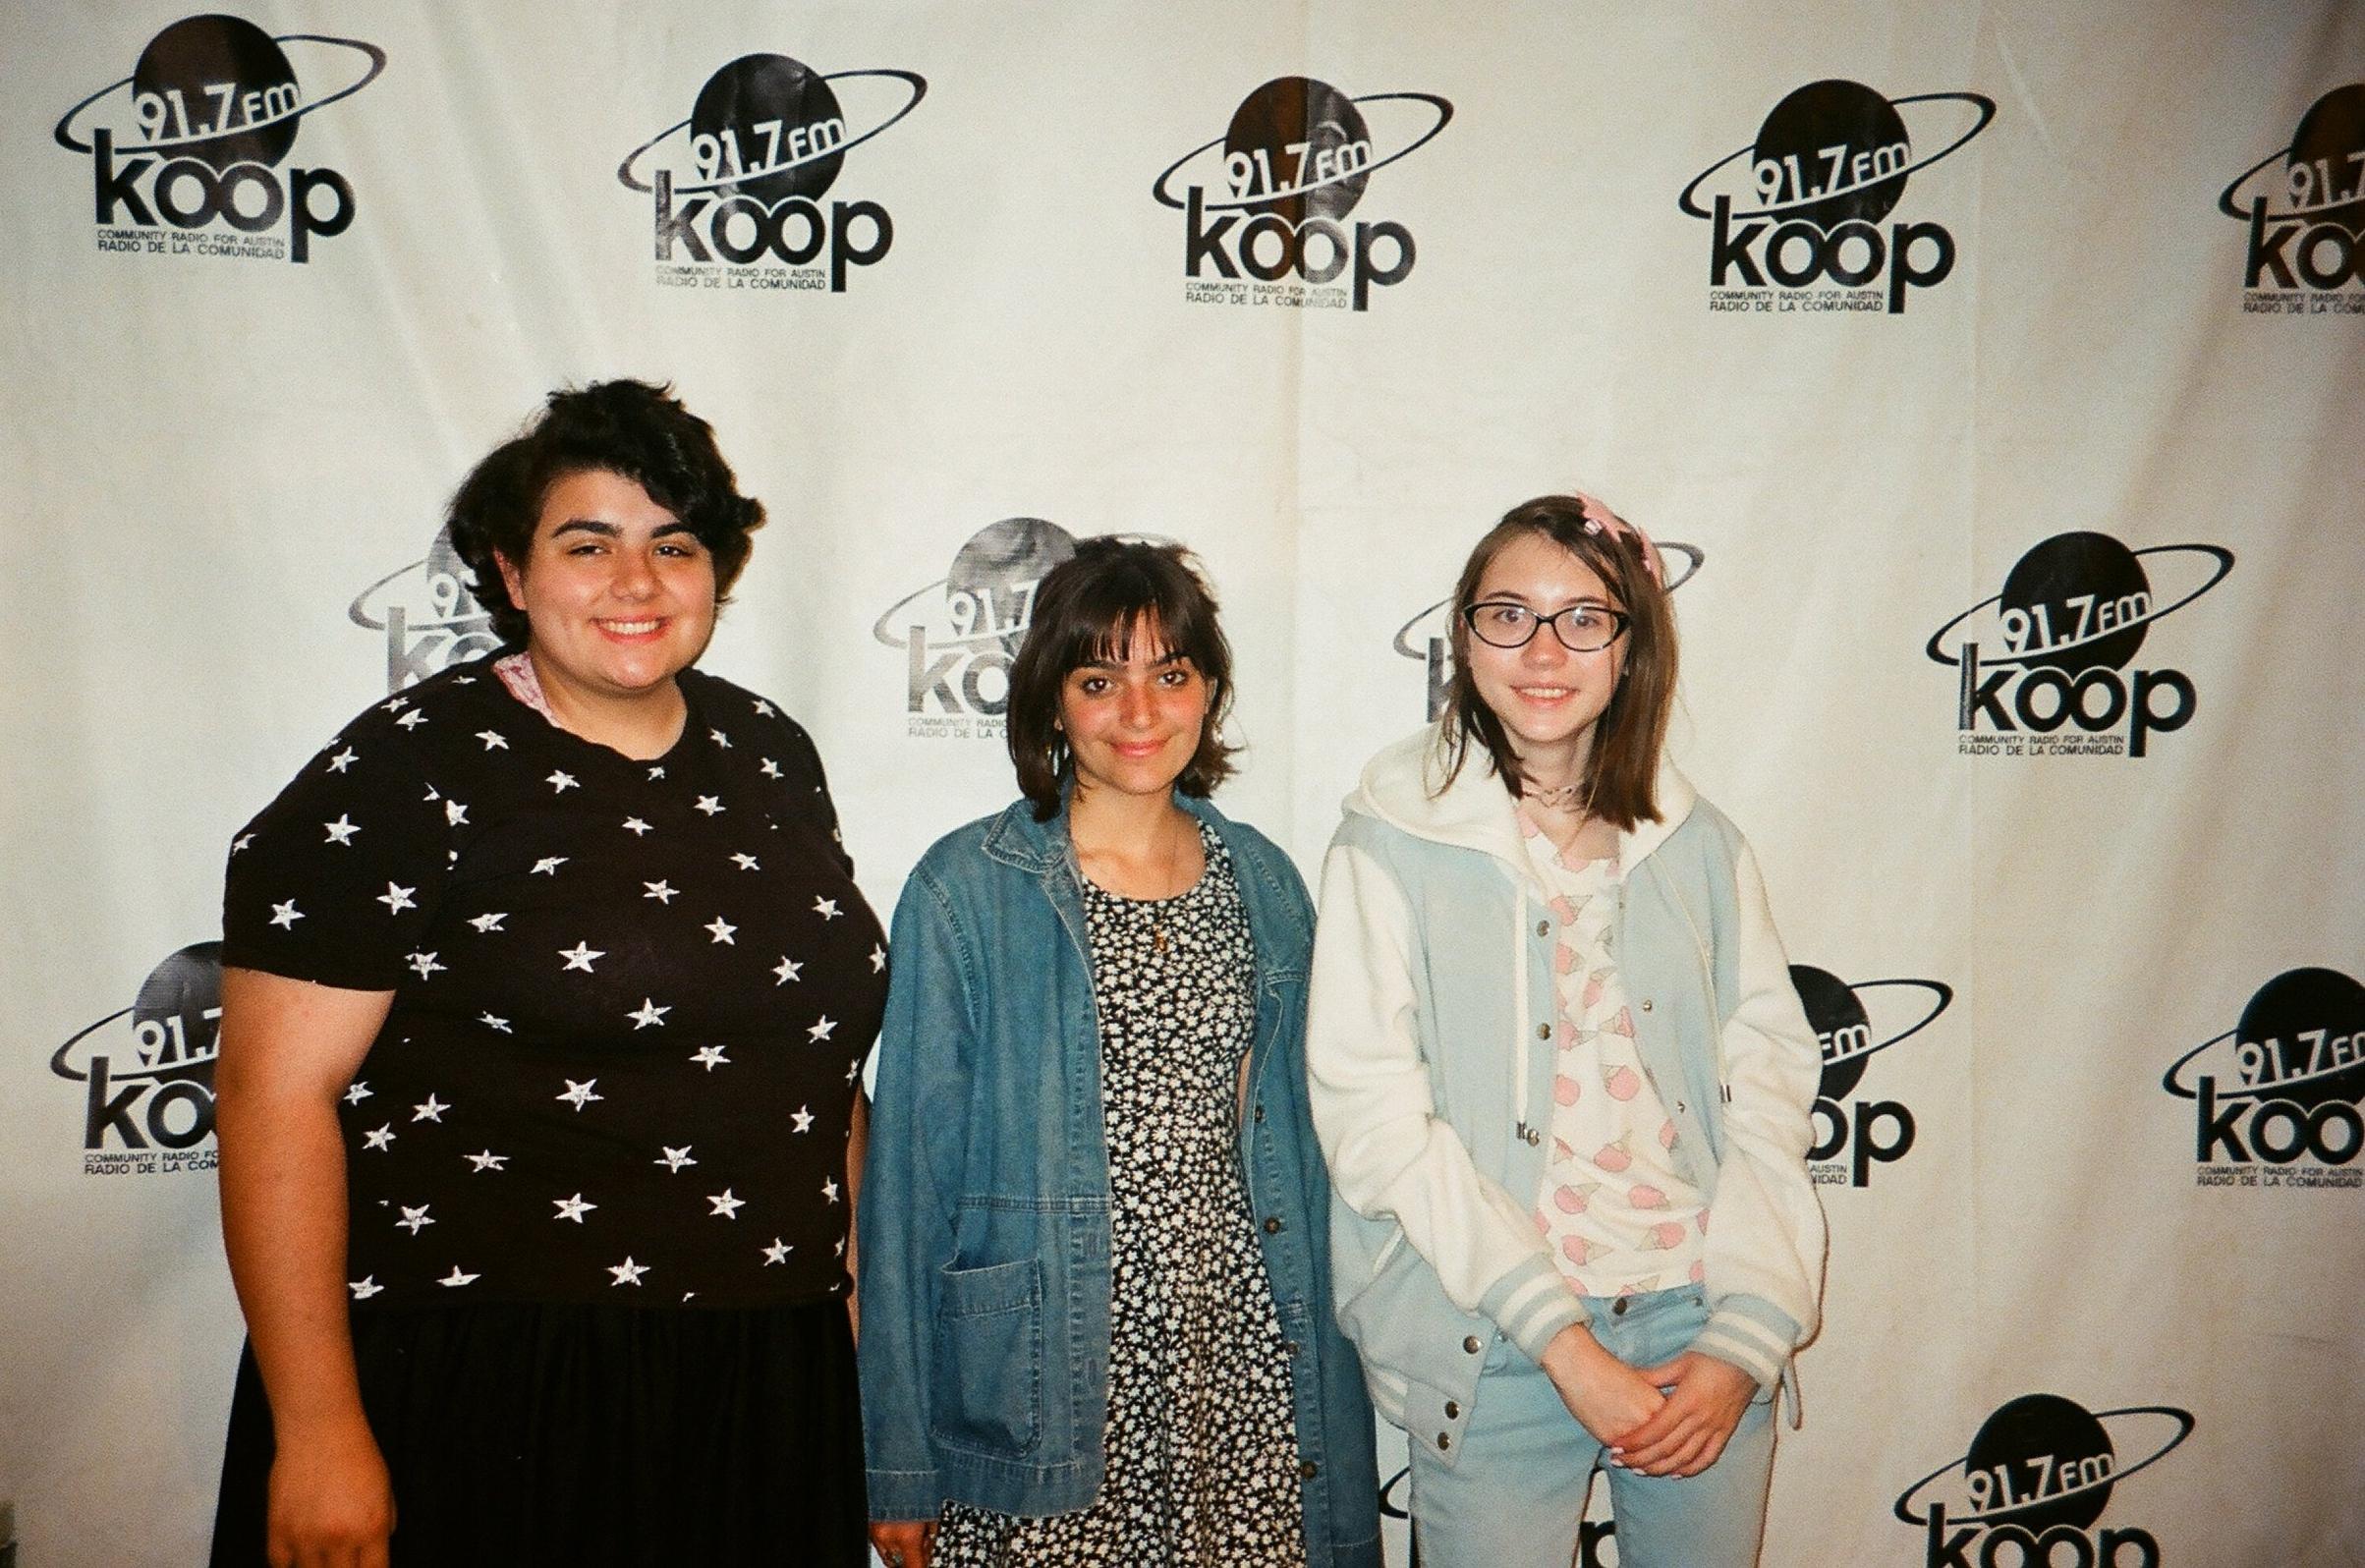 Miranda, Apol, and Maddie of Youthspin